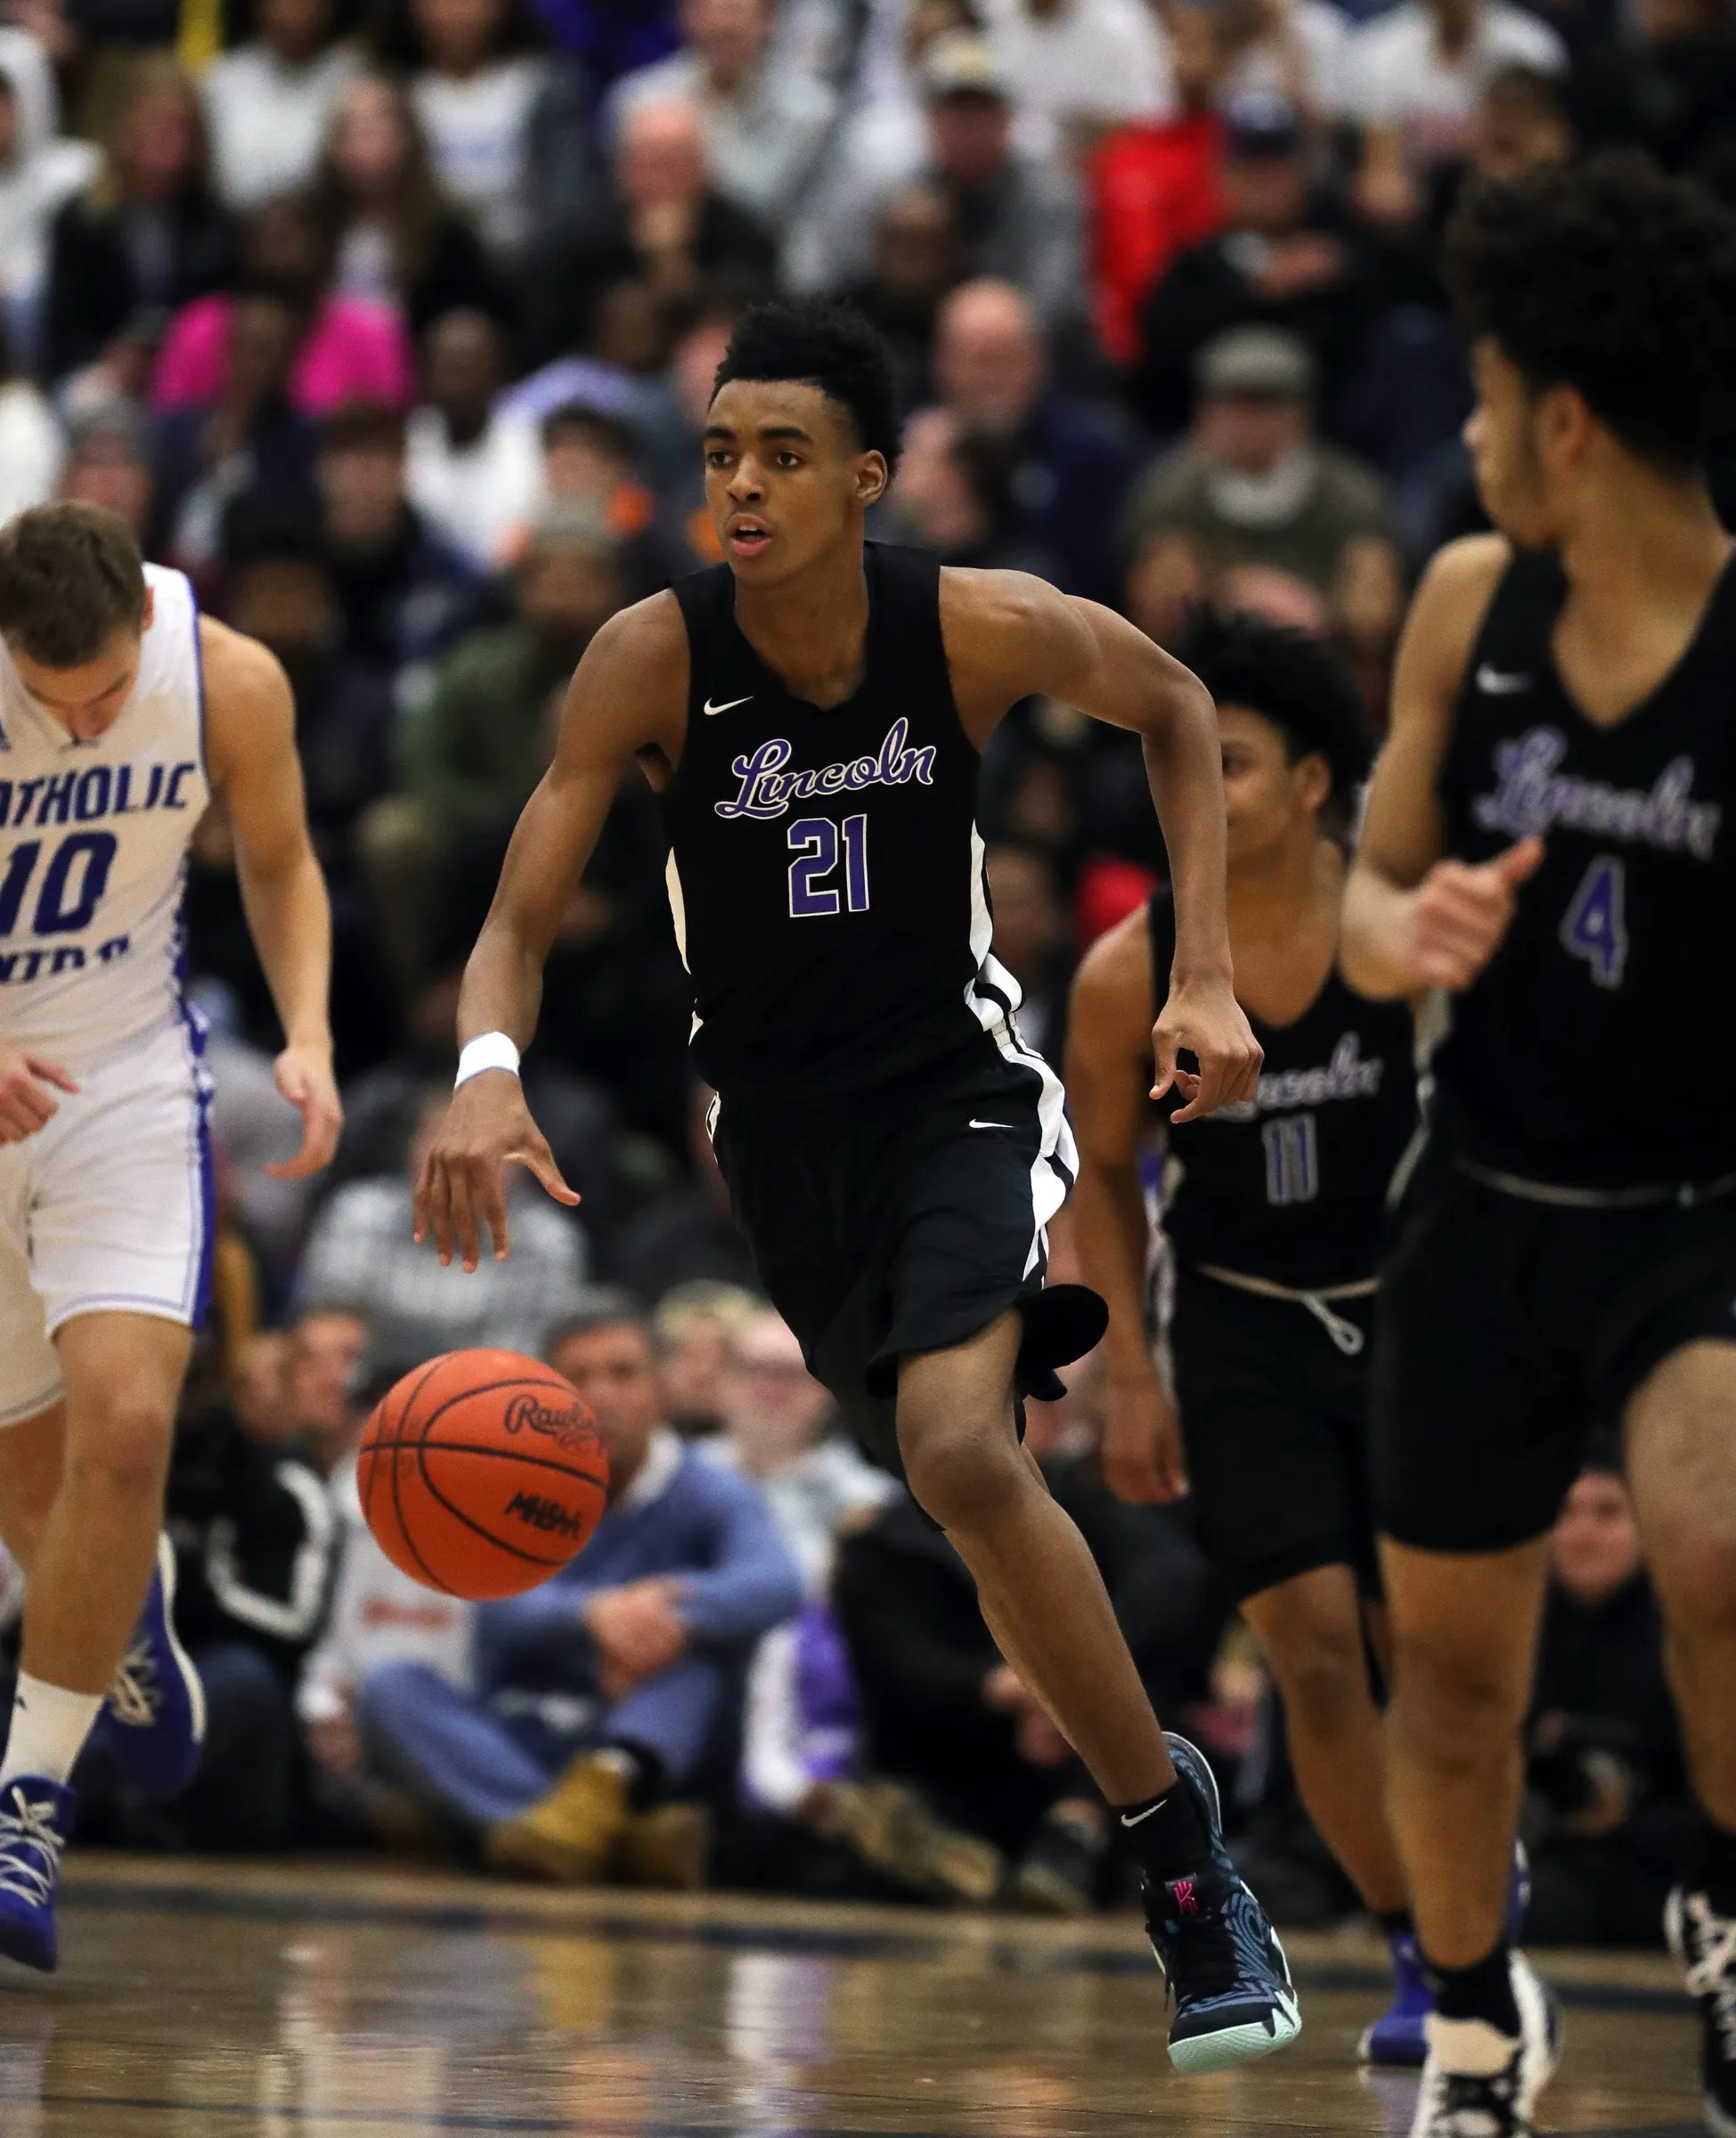 Michigan Basketball Offers Scholarship To Phenom Emoni Bates